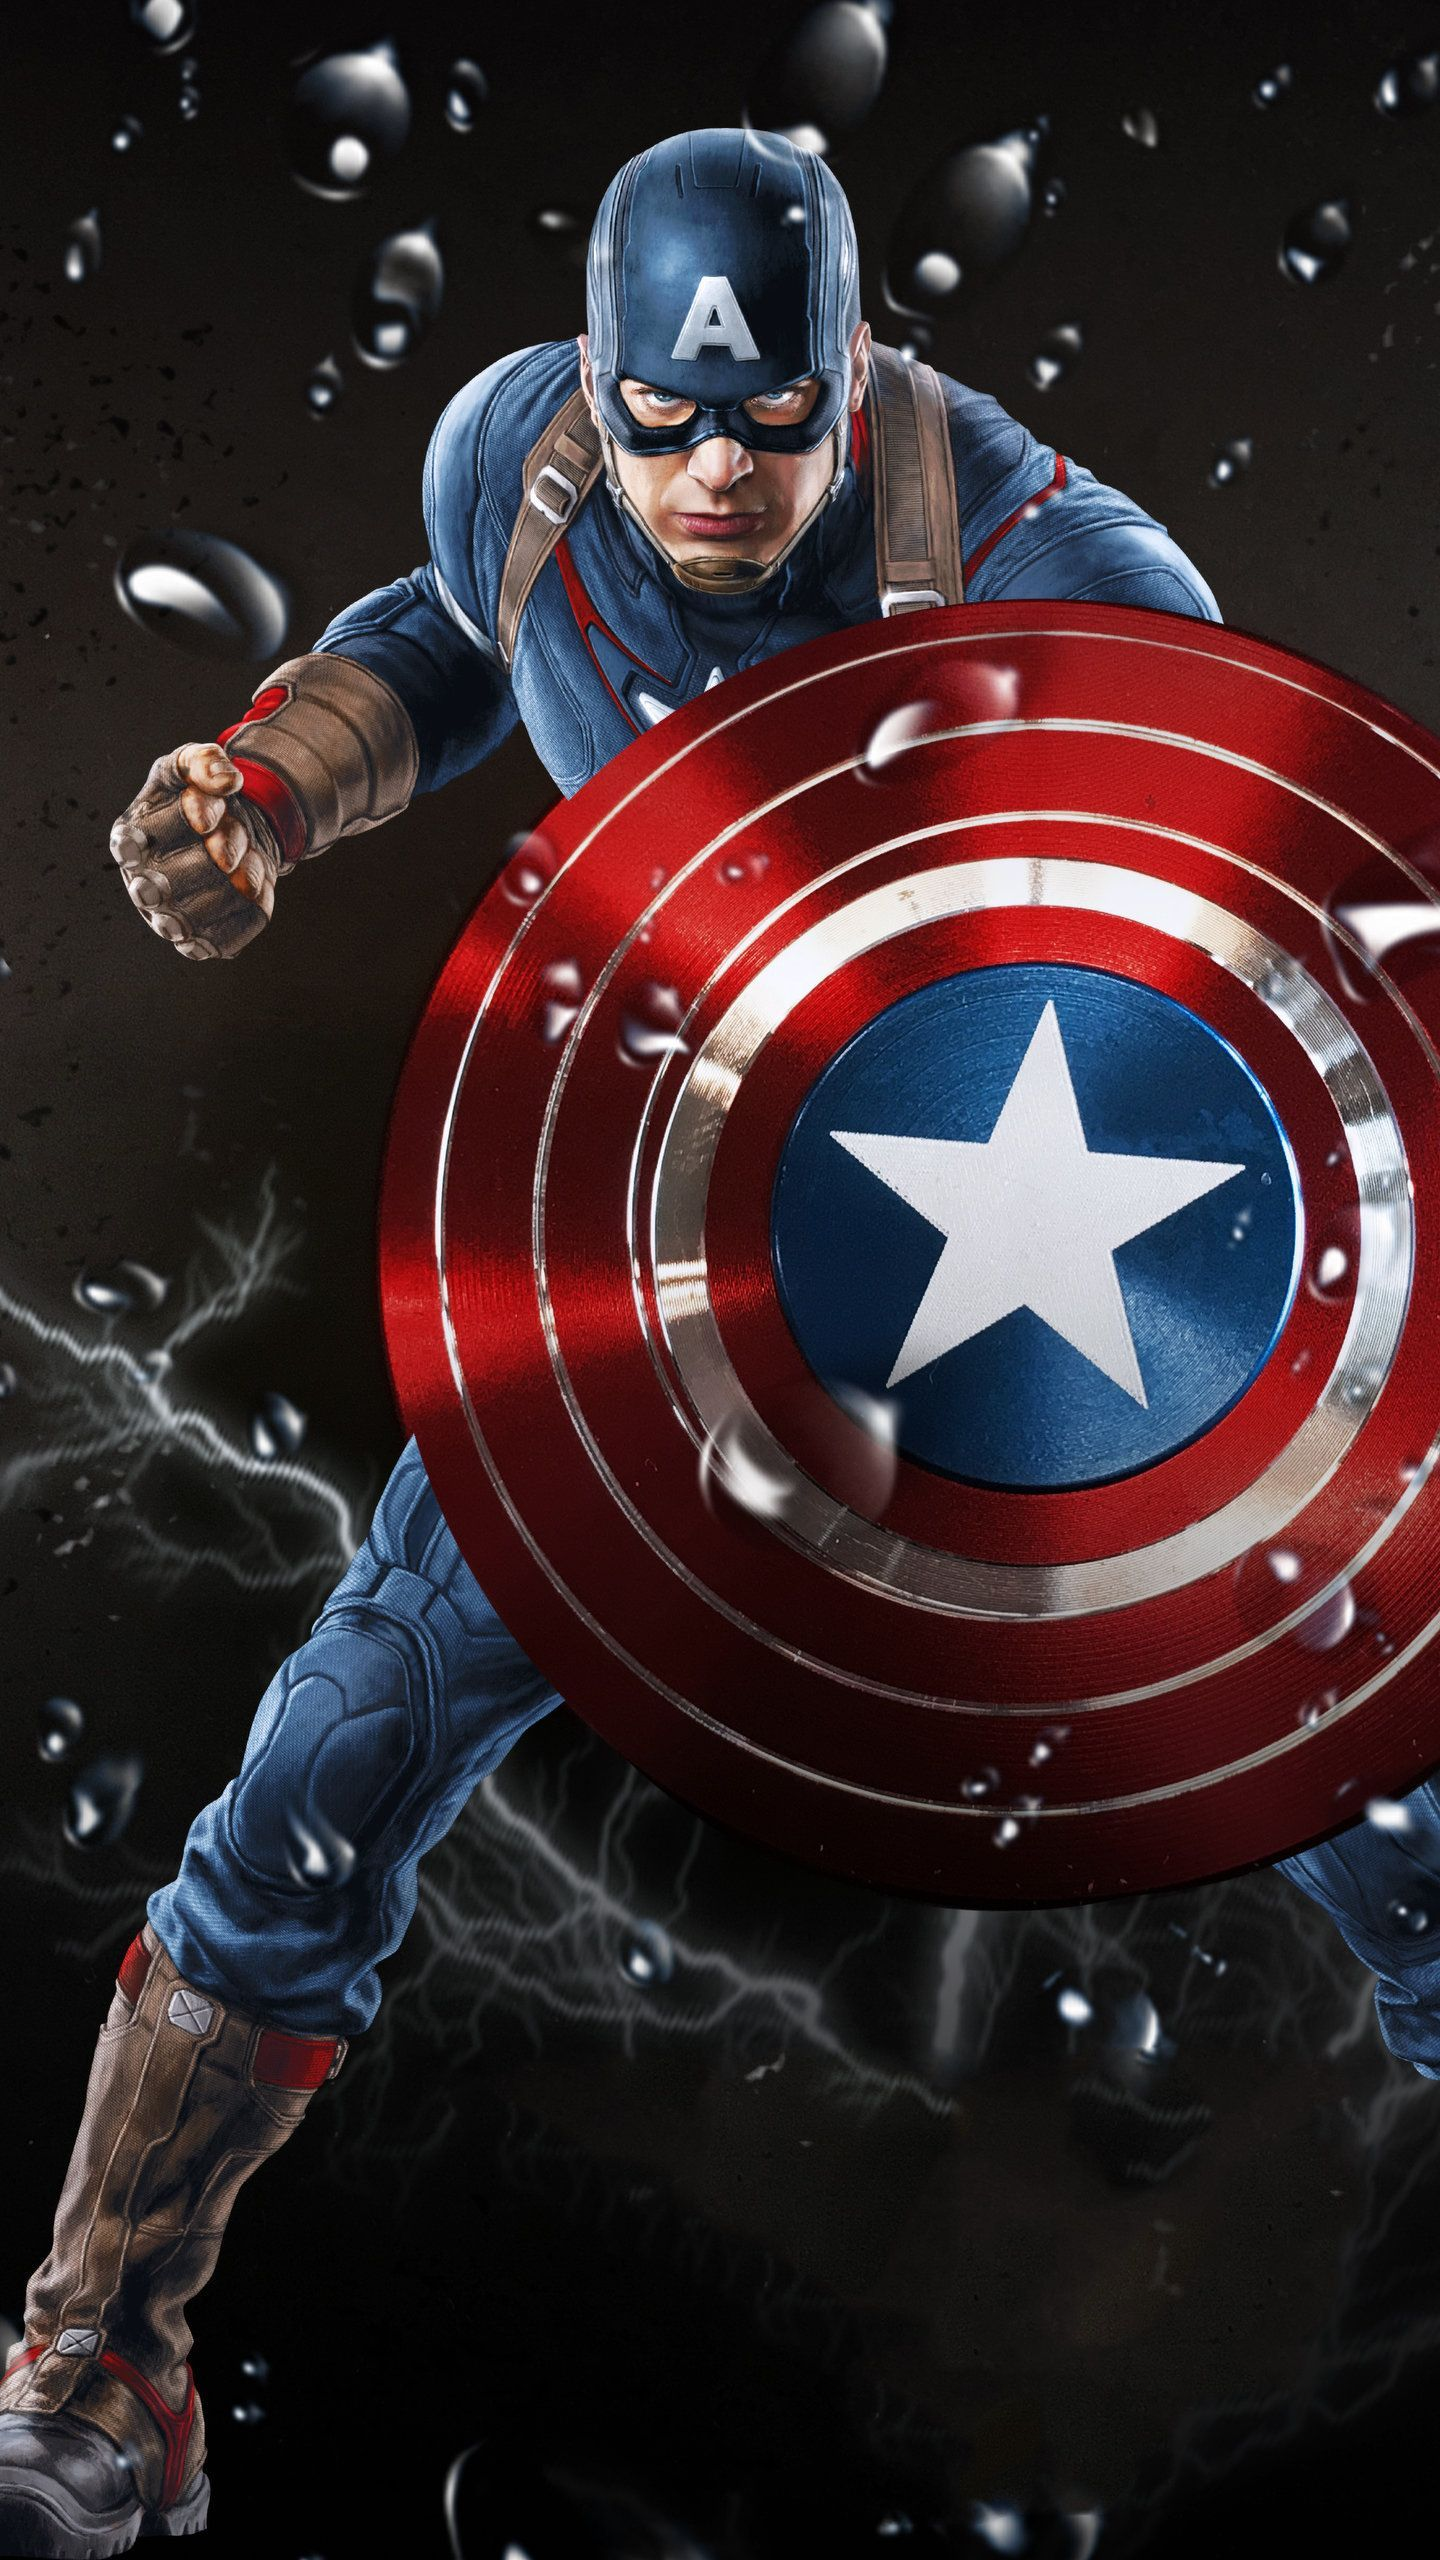 Captain America Wallpaper 4k Hd Captain America Wallpaper Captain America Art Marvel Comics Wallpaper